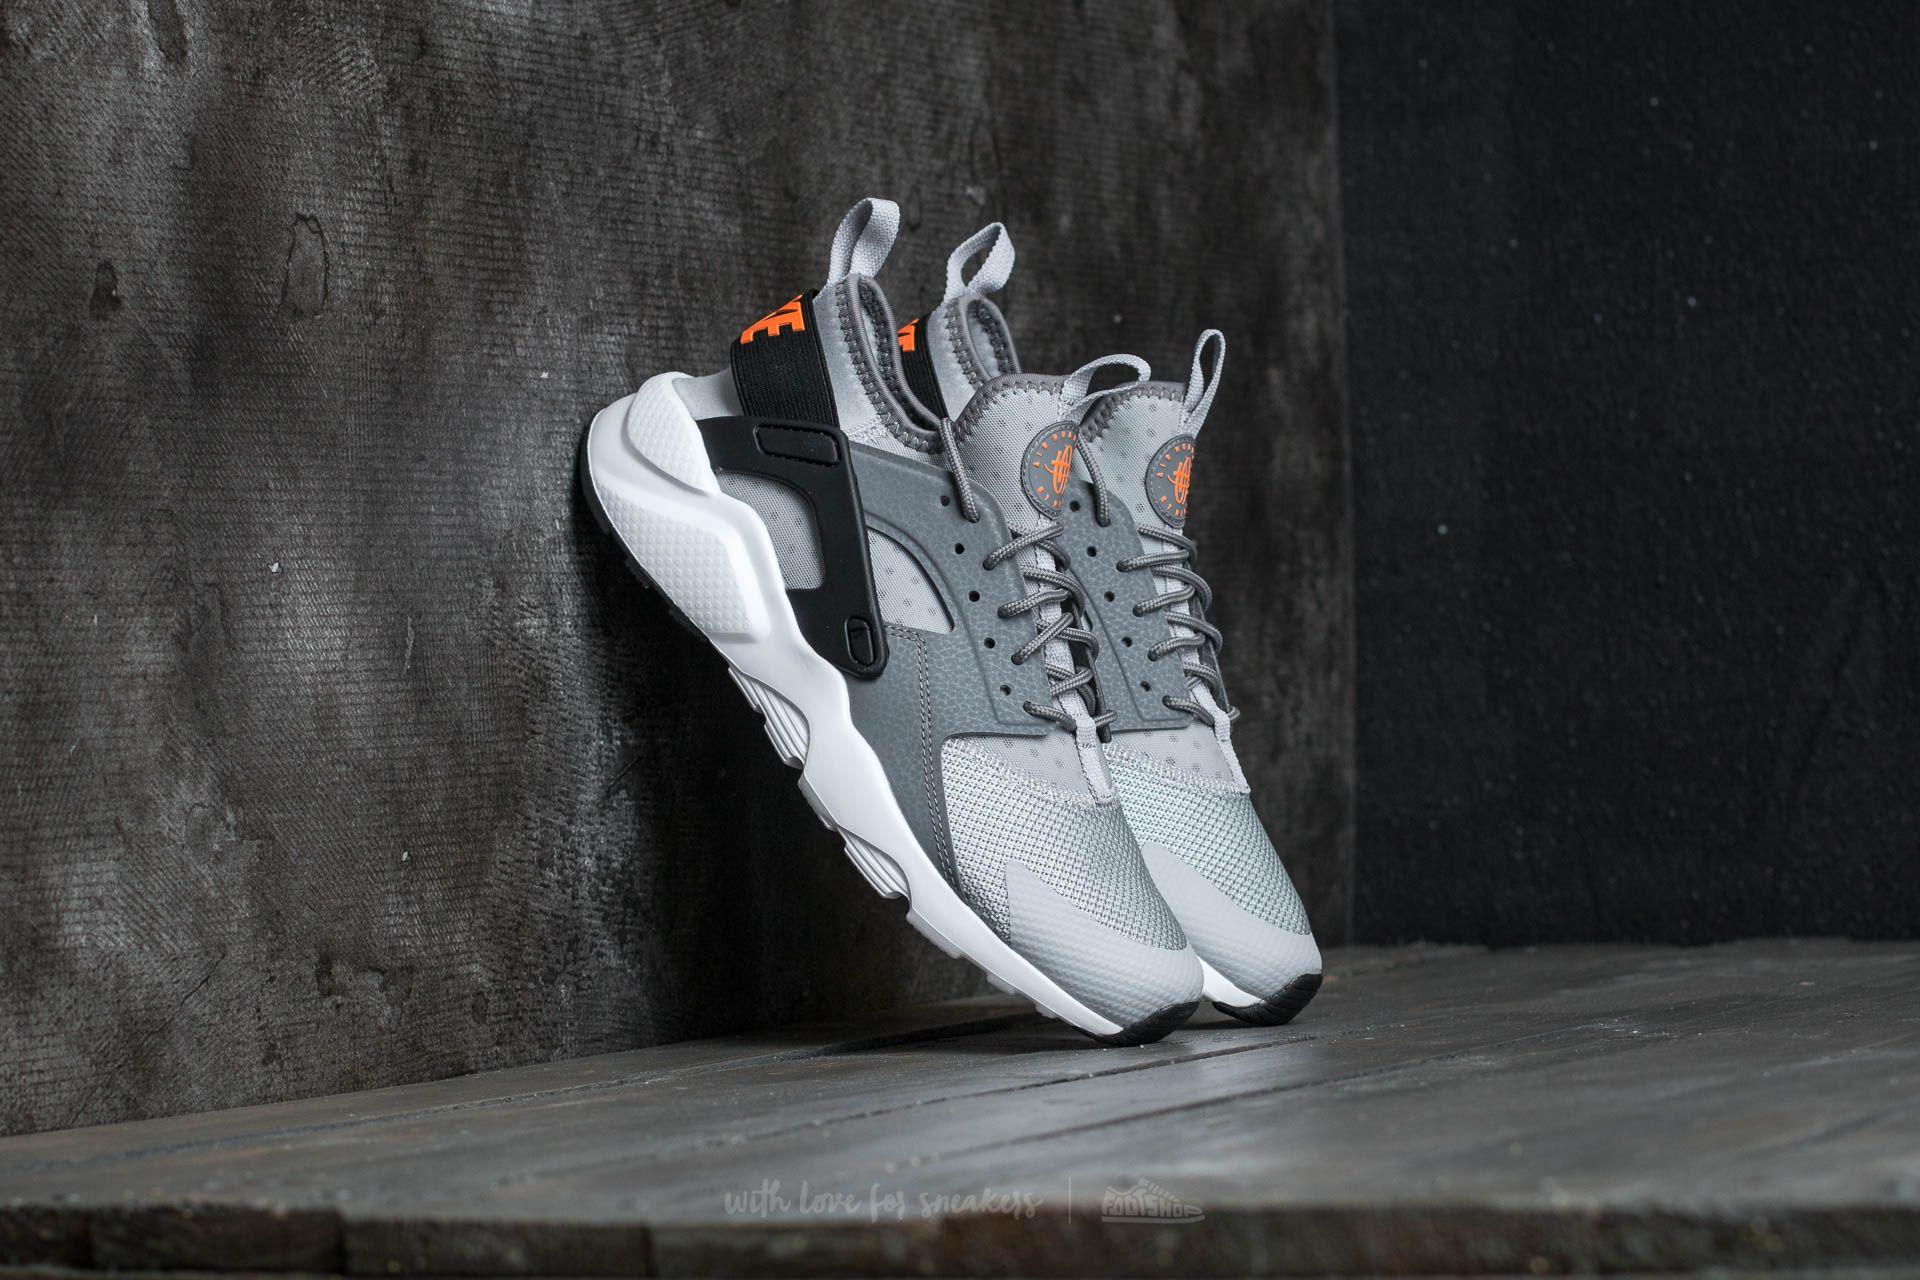 nike air huarache ultra max orange wolf grey anthracite black